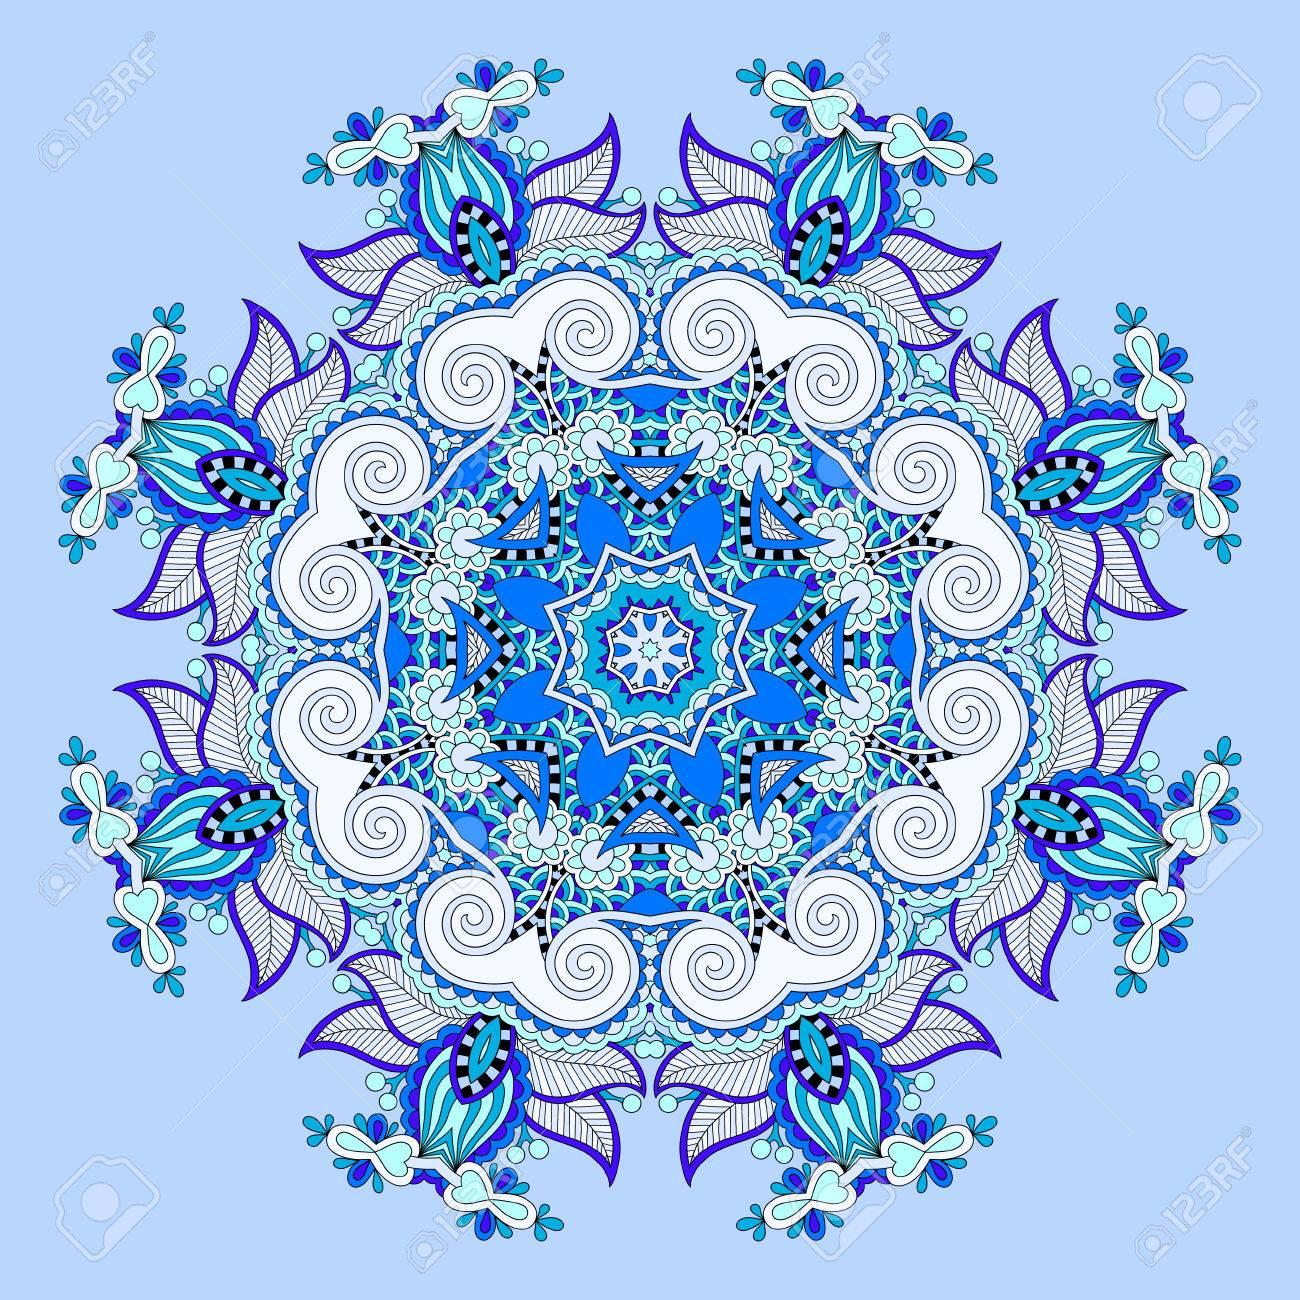 Mandala blue circle decorative spiritual indian symbol of lotus mandala blue circle decorative spiritual indian symbol of lotus flower round ornament pattern mightylinksfo